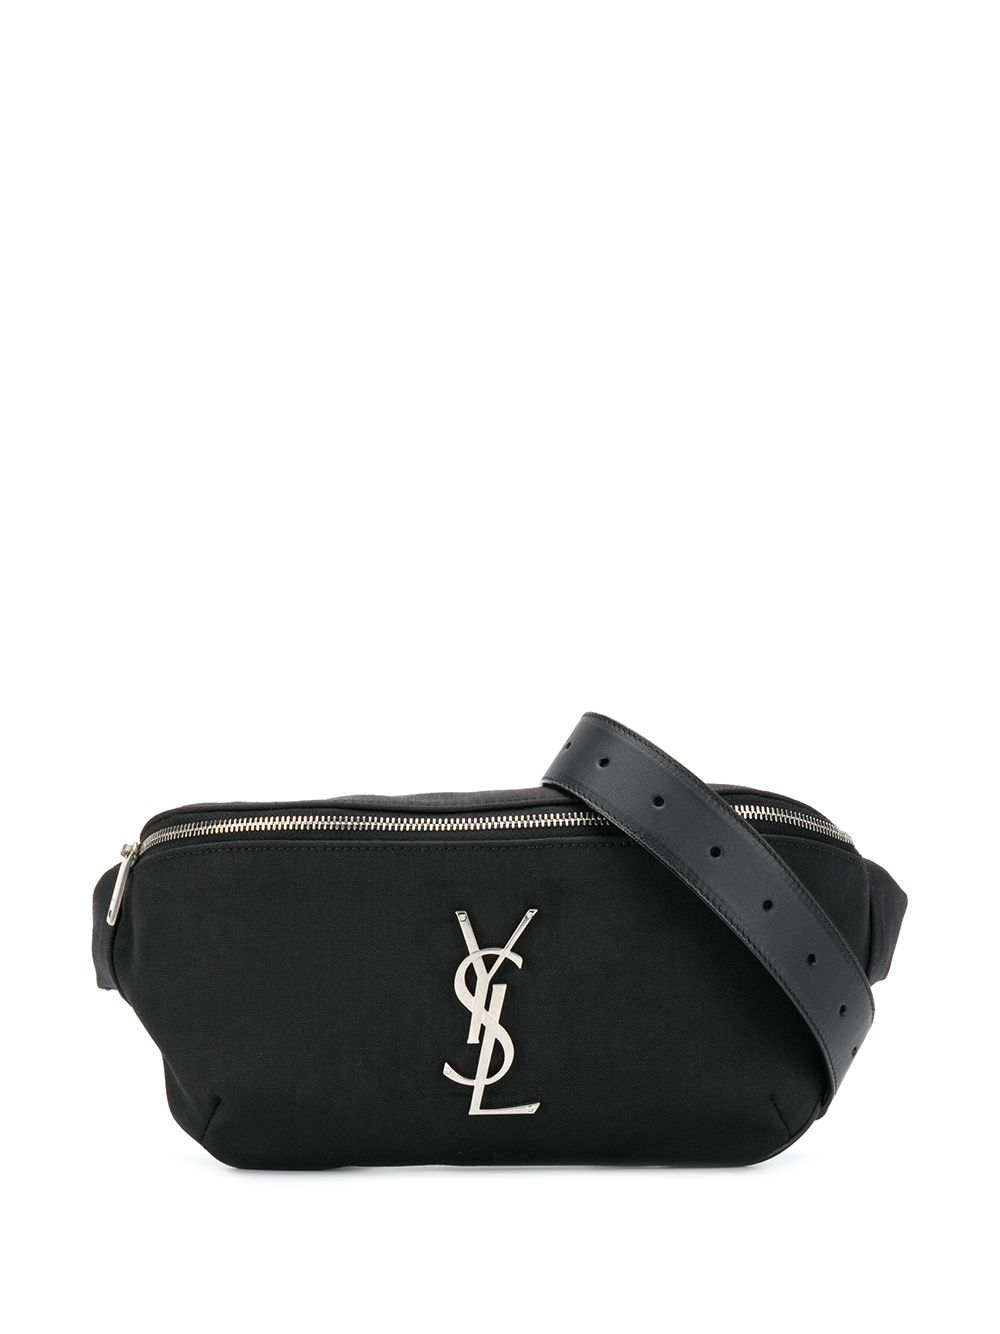 Monogram Leather Beltbag